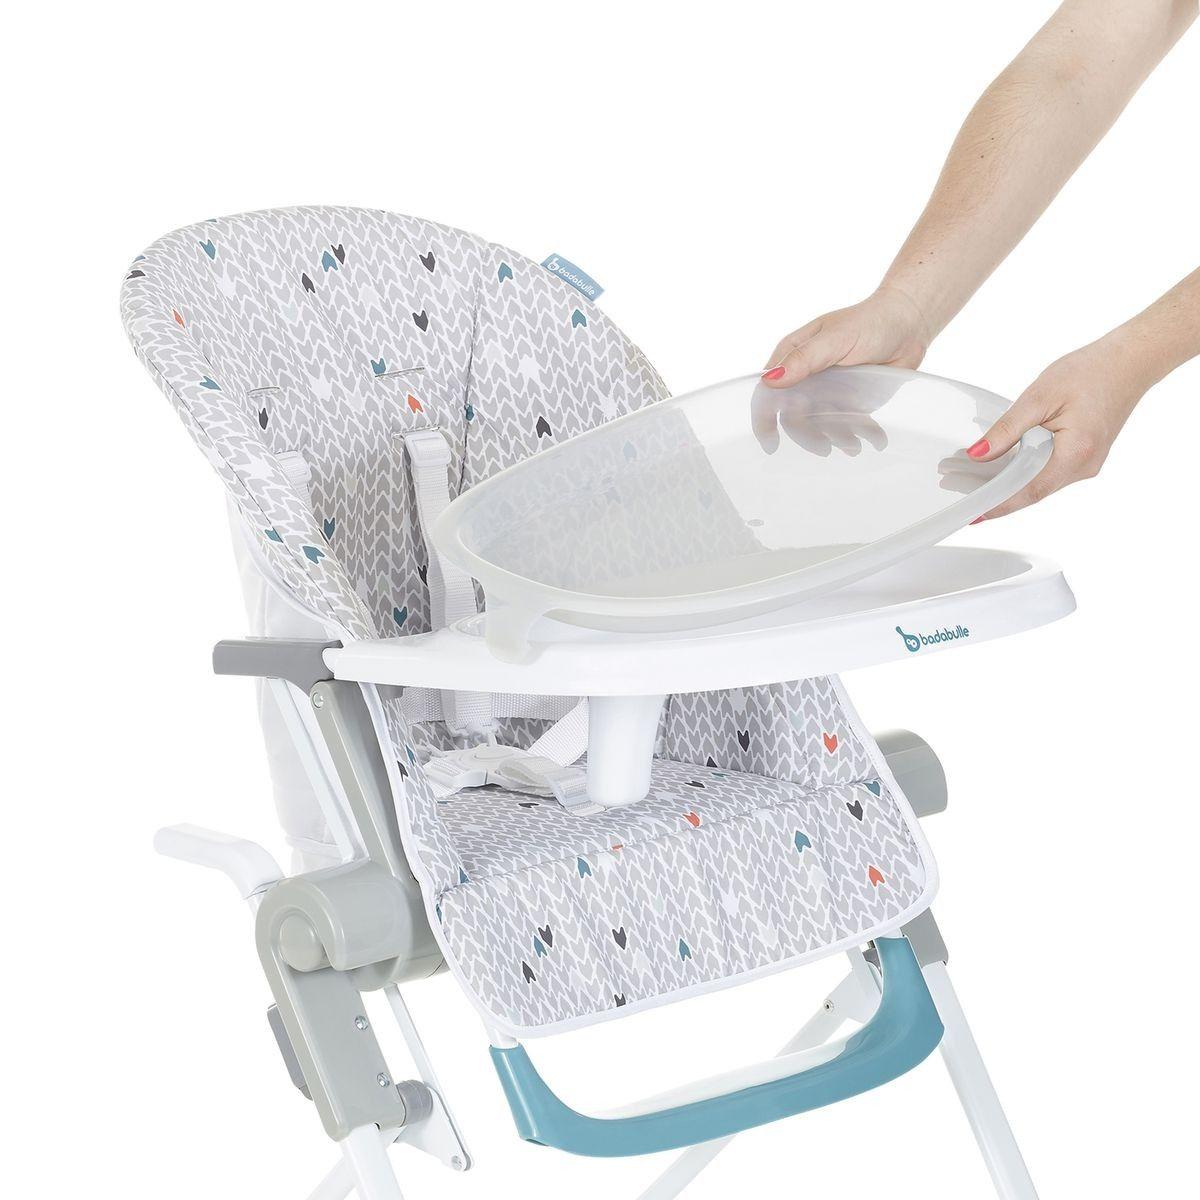 Chaise Haute Compacte B01070 Taille Tu Chaise Haute Bebe Chaise